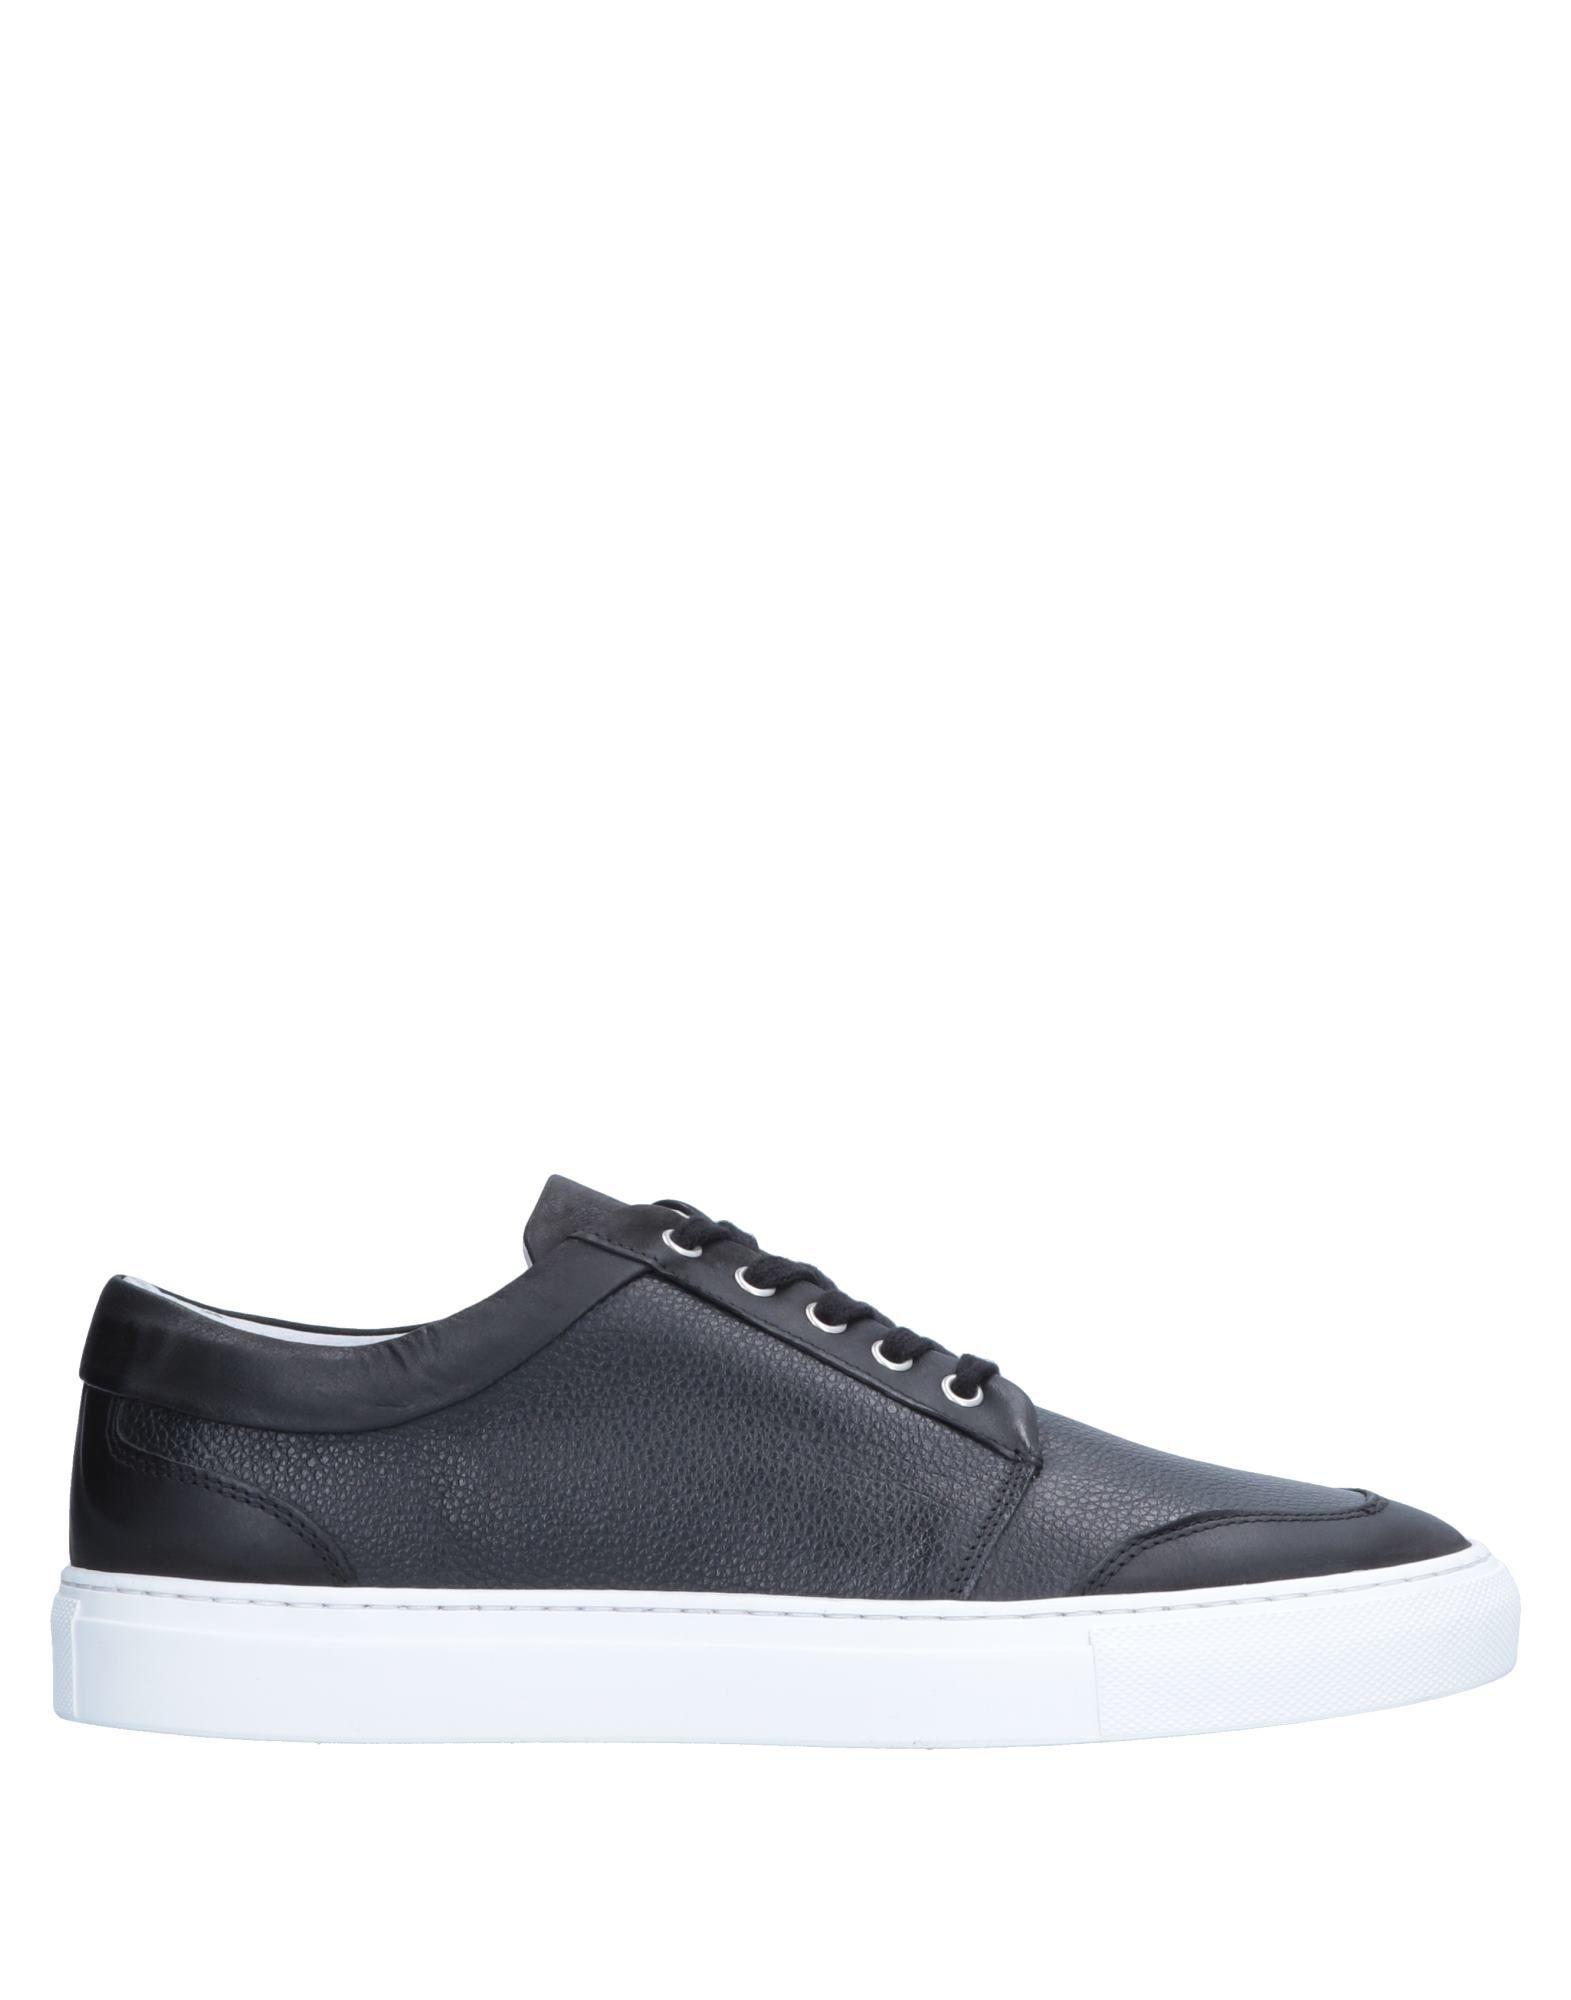 Fabiano Ricci Sneakers Herren beliebte  11546947BX Gute Qualität beliebte Herren Schuhe b47ba3